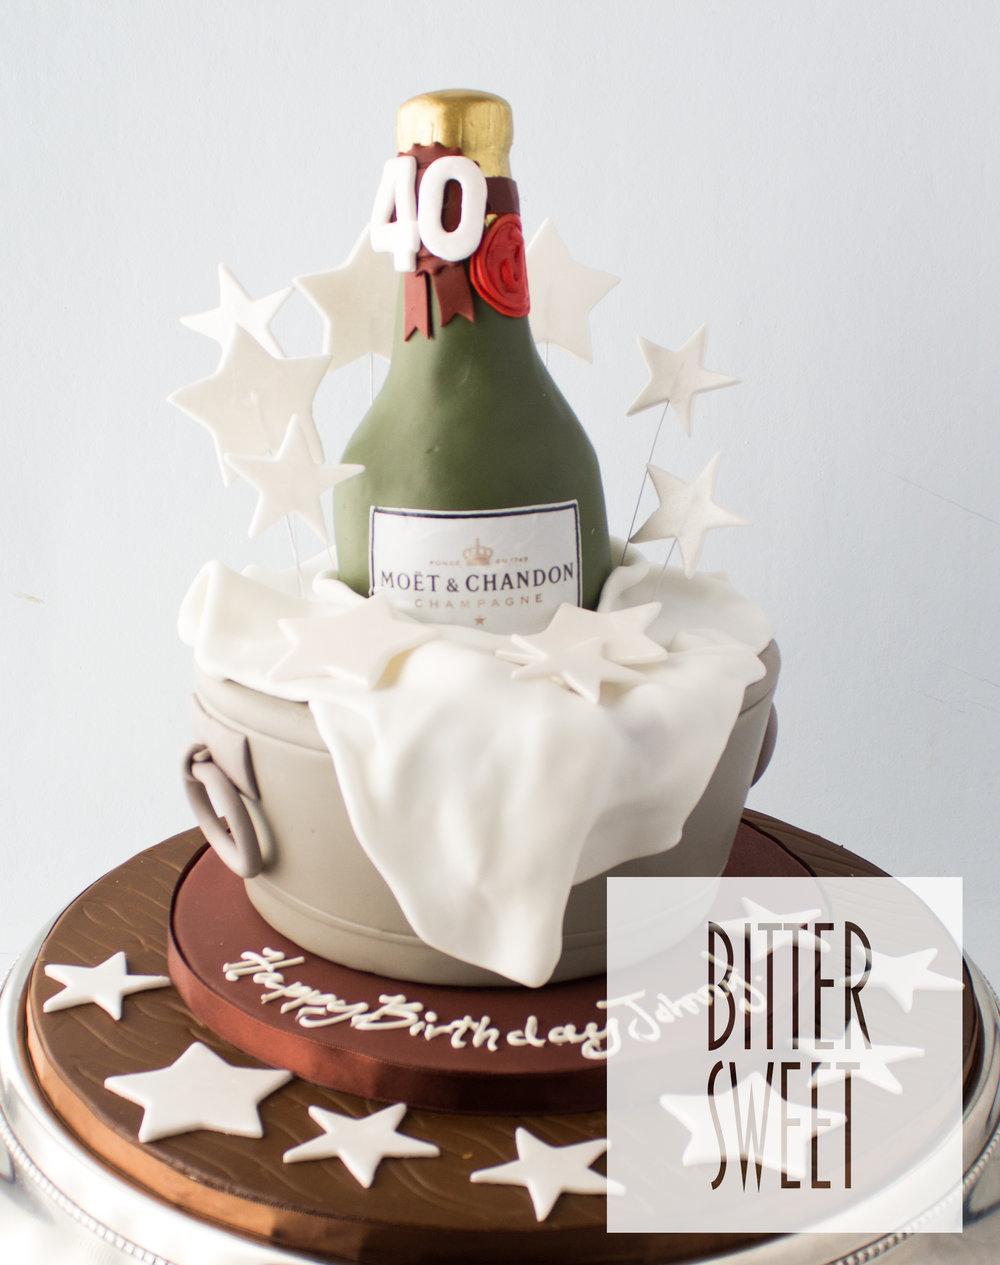 Bittersweet_3D_Champagne.jpg